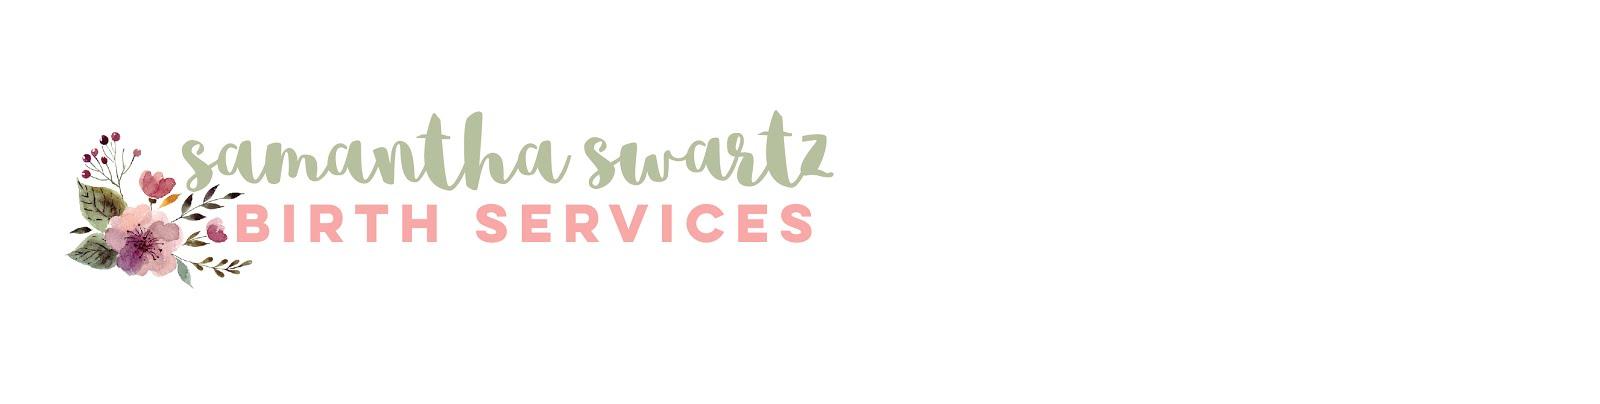 Samantha Swartz, Doula Services